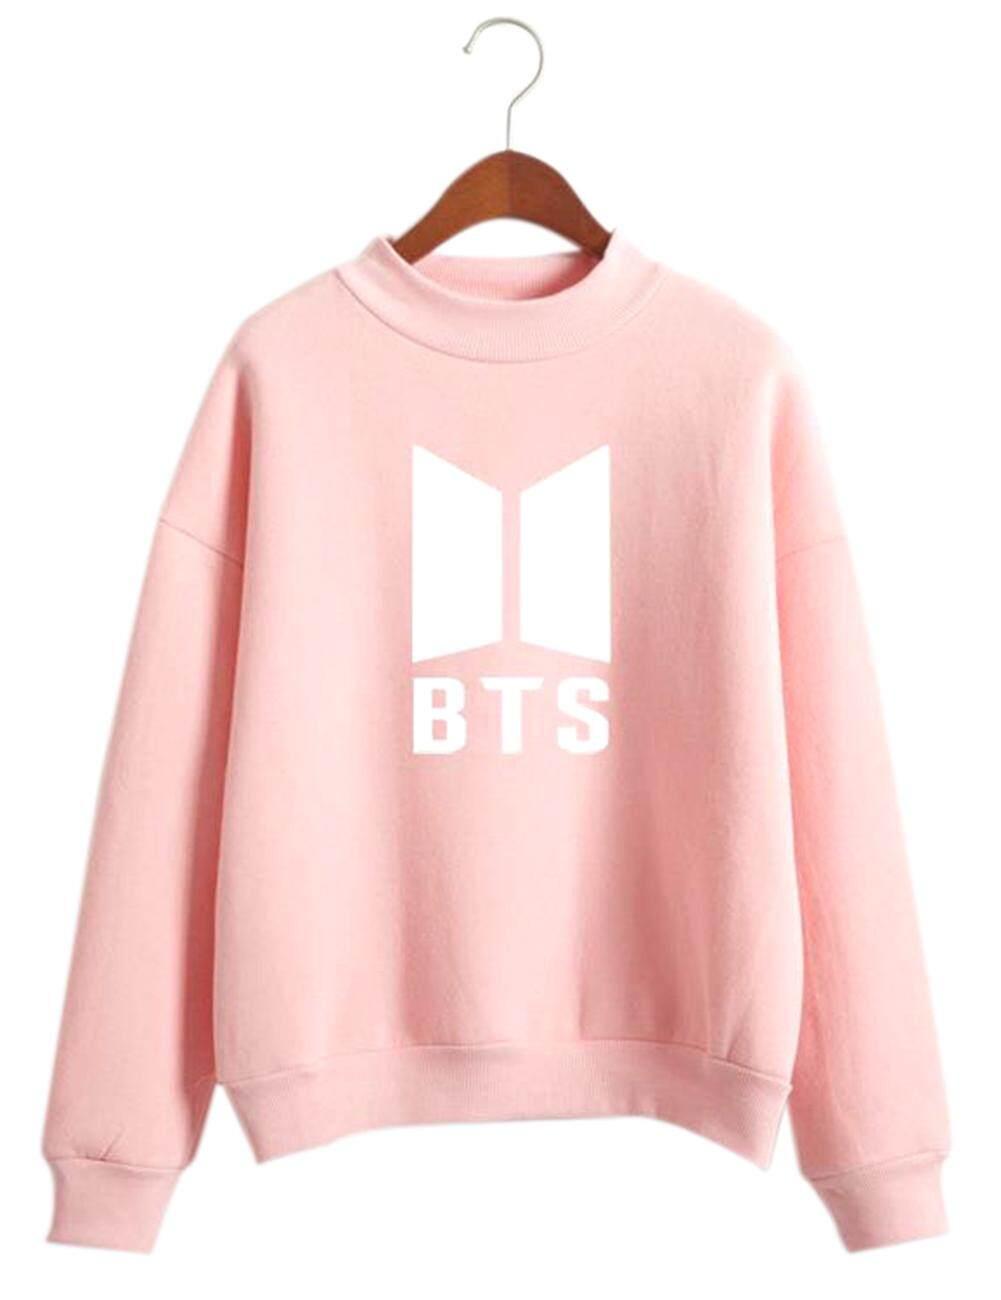 Womens Sweaters Cardigans Buy At Sweater Wanita Bts Unisex Letters Round Collar Fleece Lining Comfortshirt S Xl